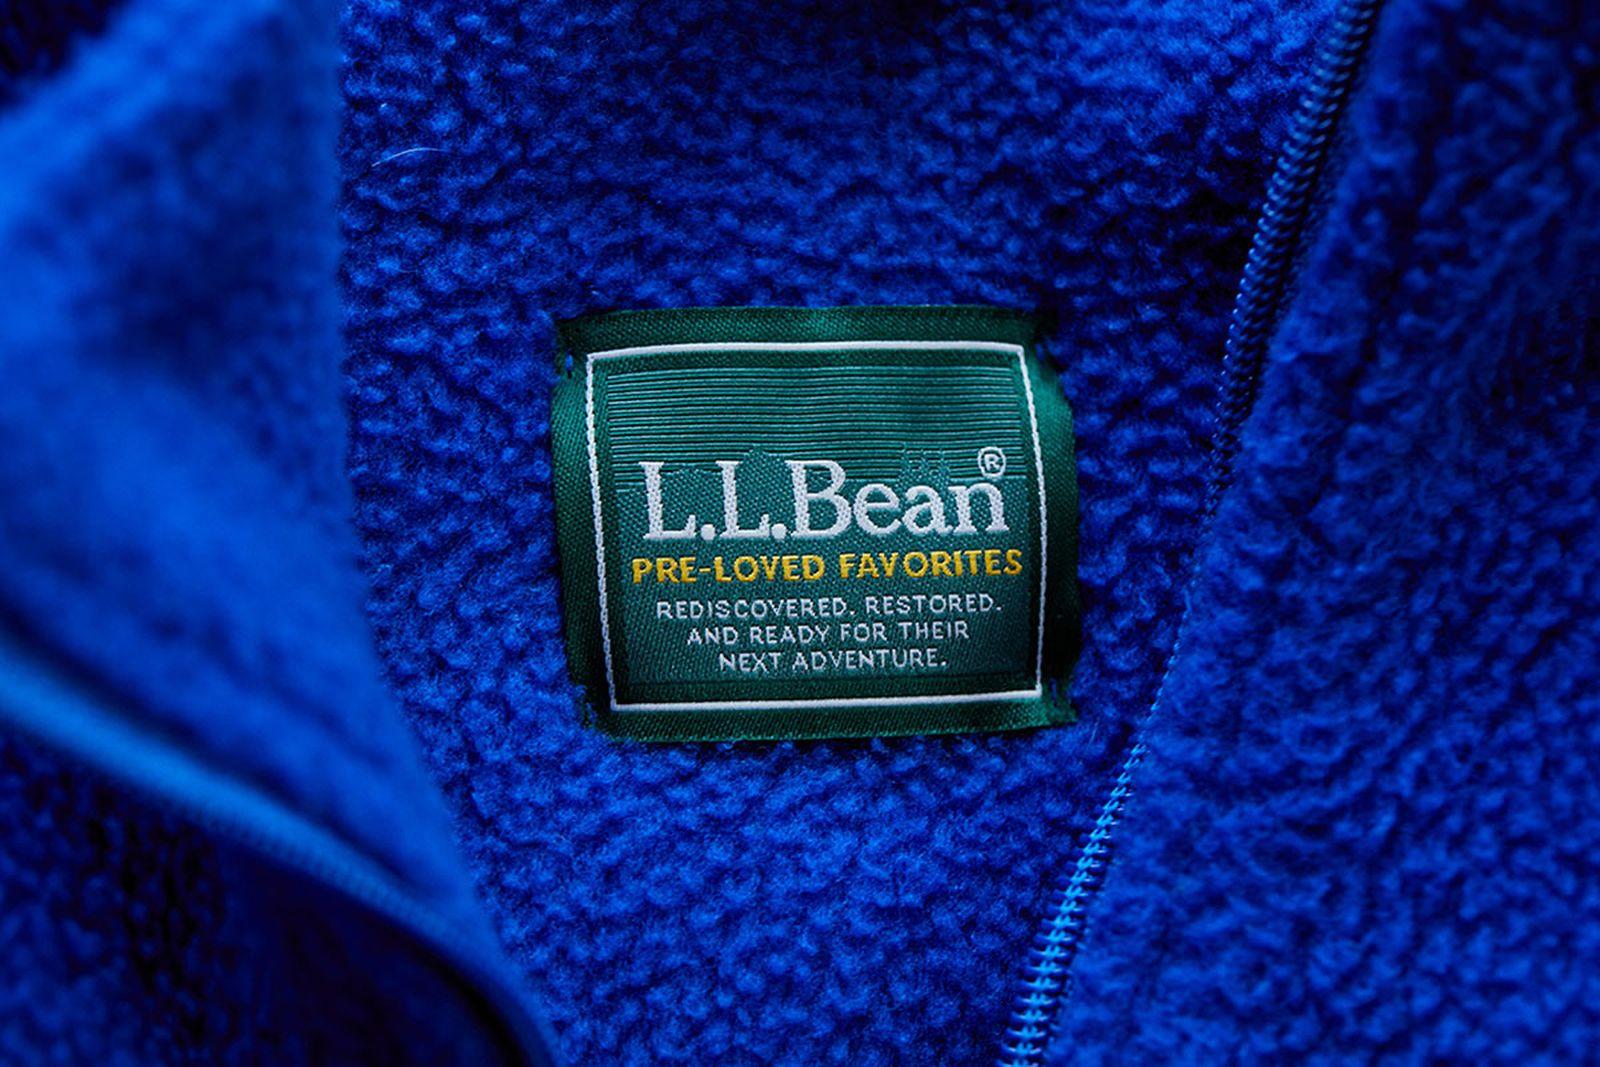 ll-bean-pre-loved-vintage-01